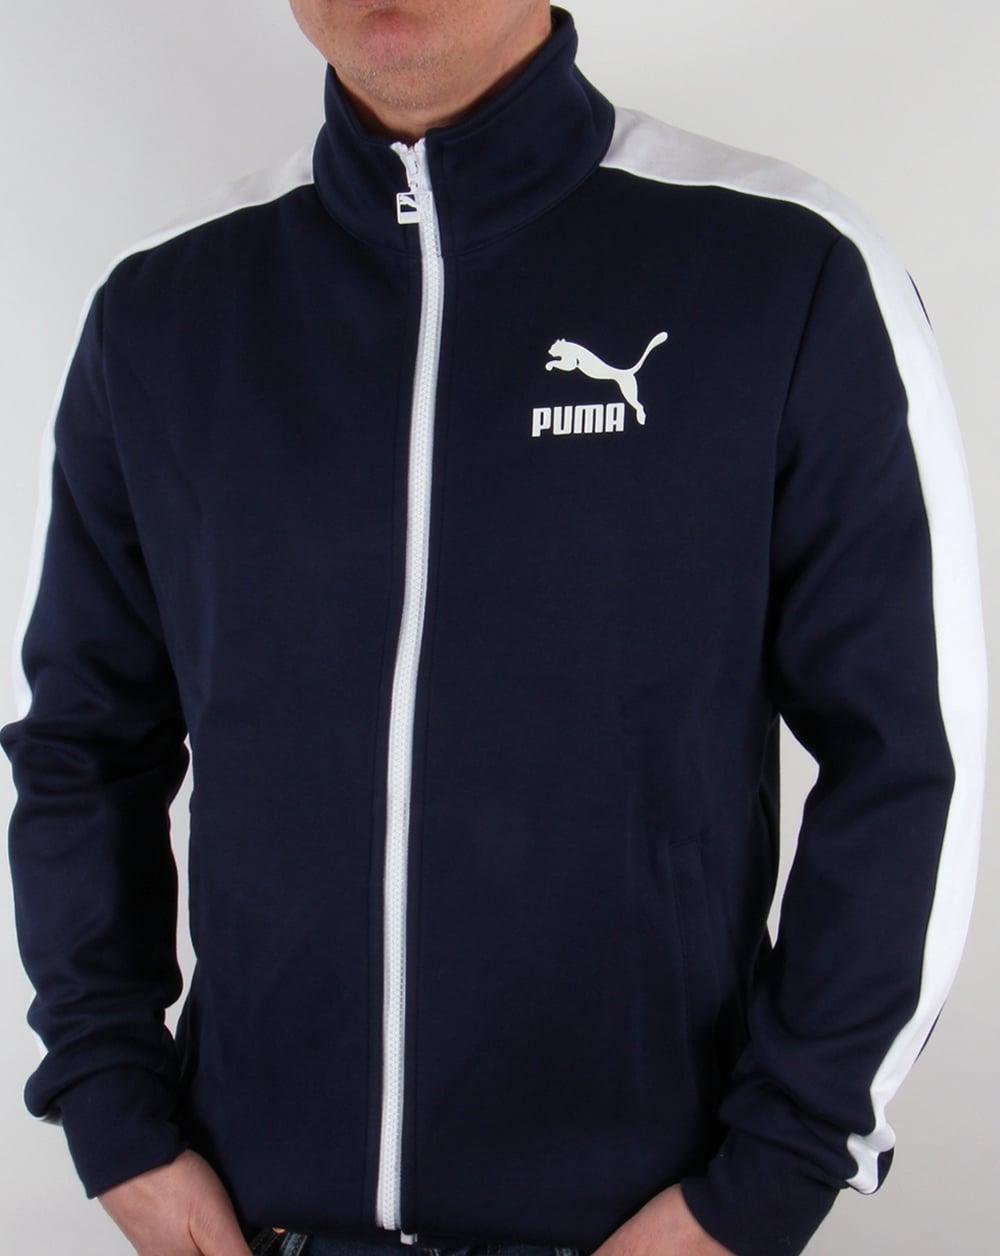 blue and white puma tracksuit